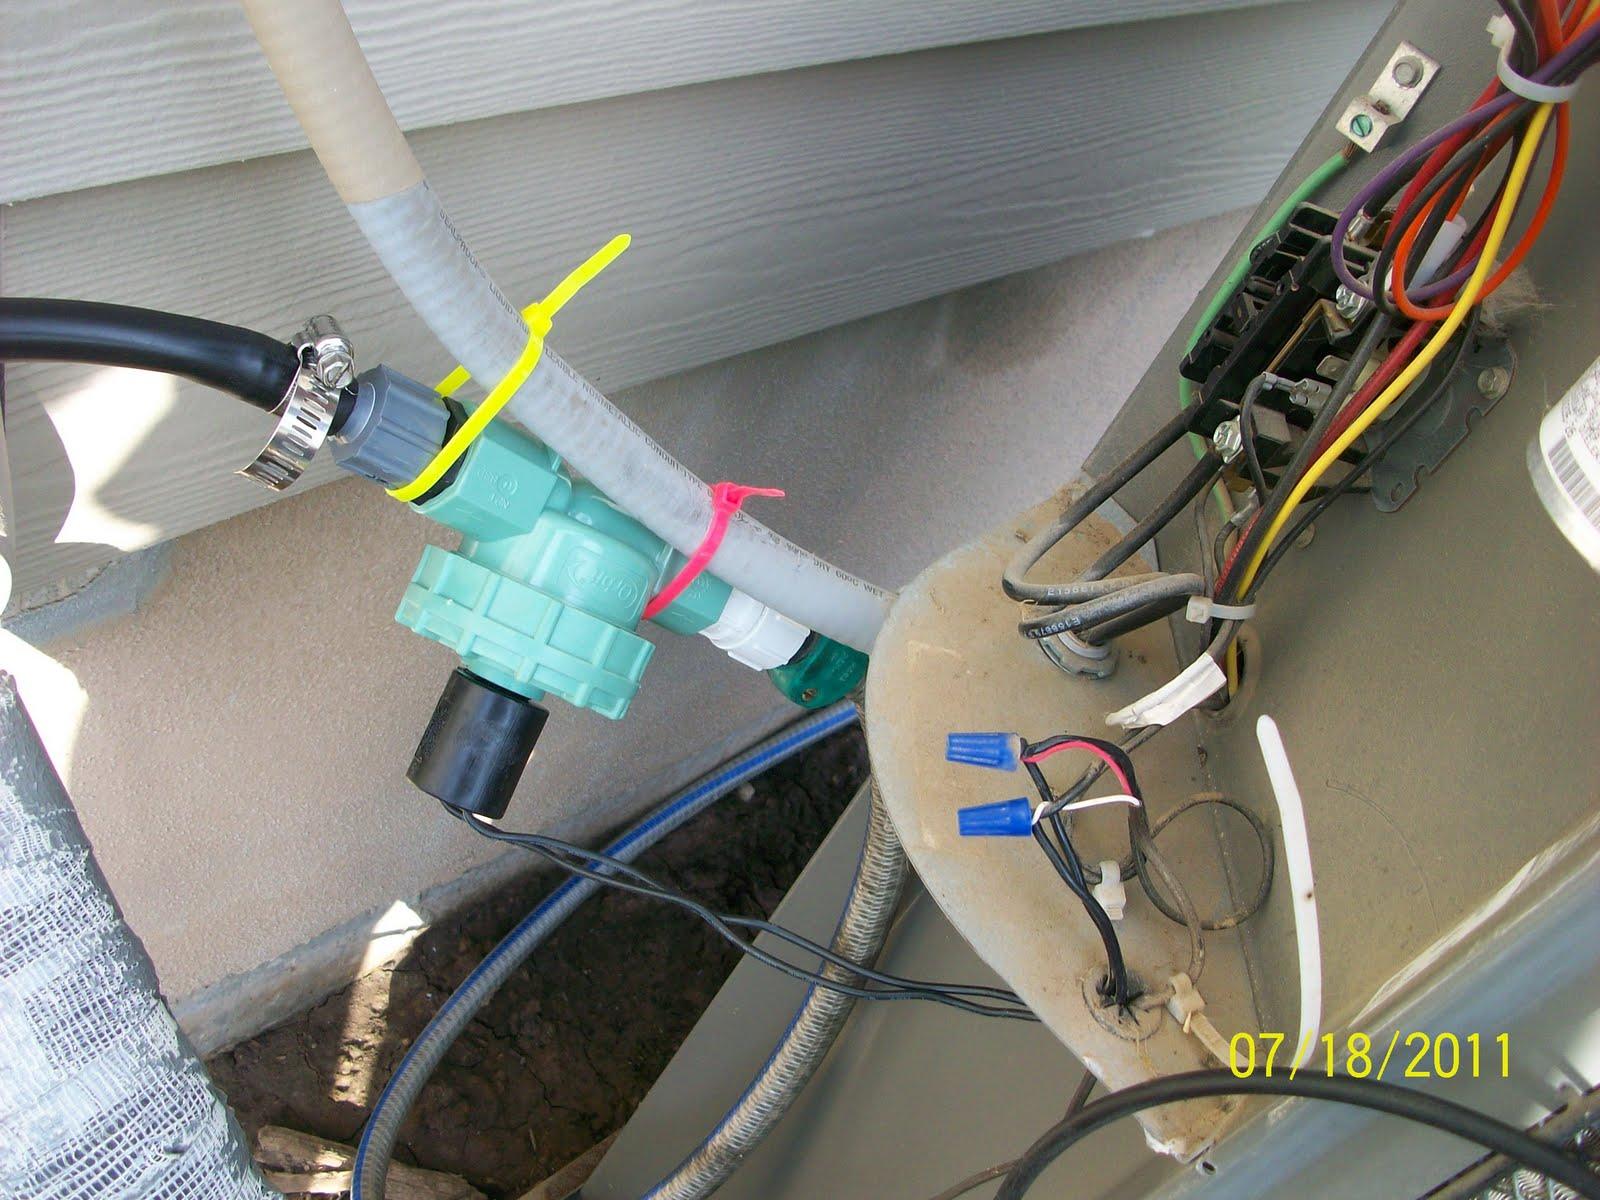 How do i turn my sprinkler system back on